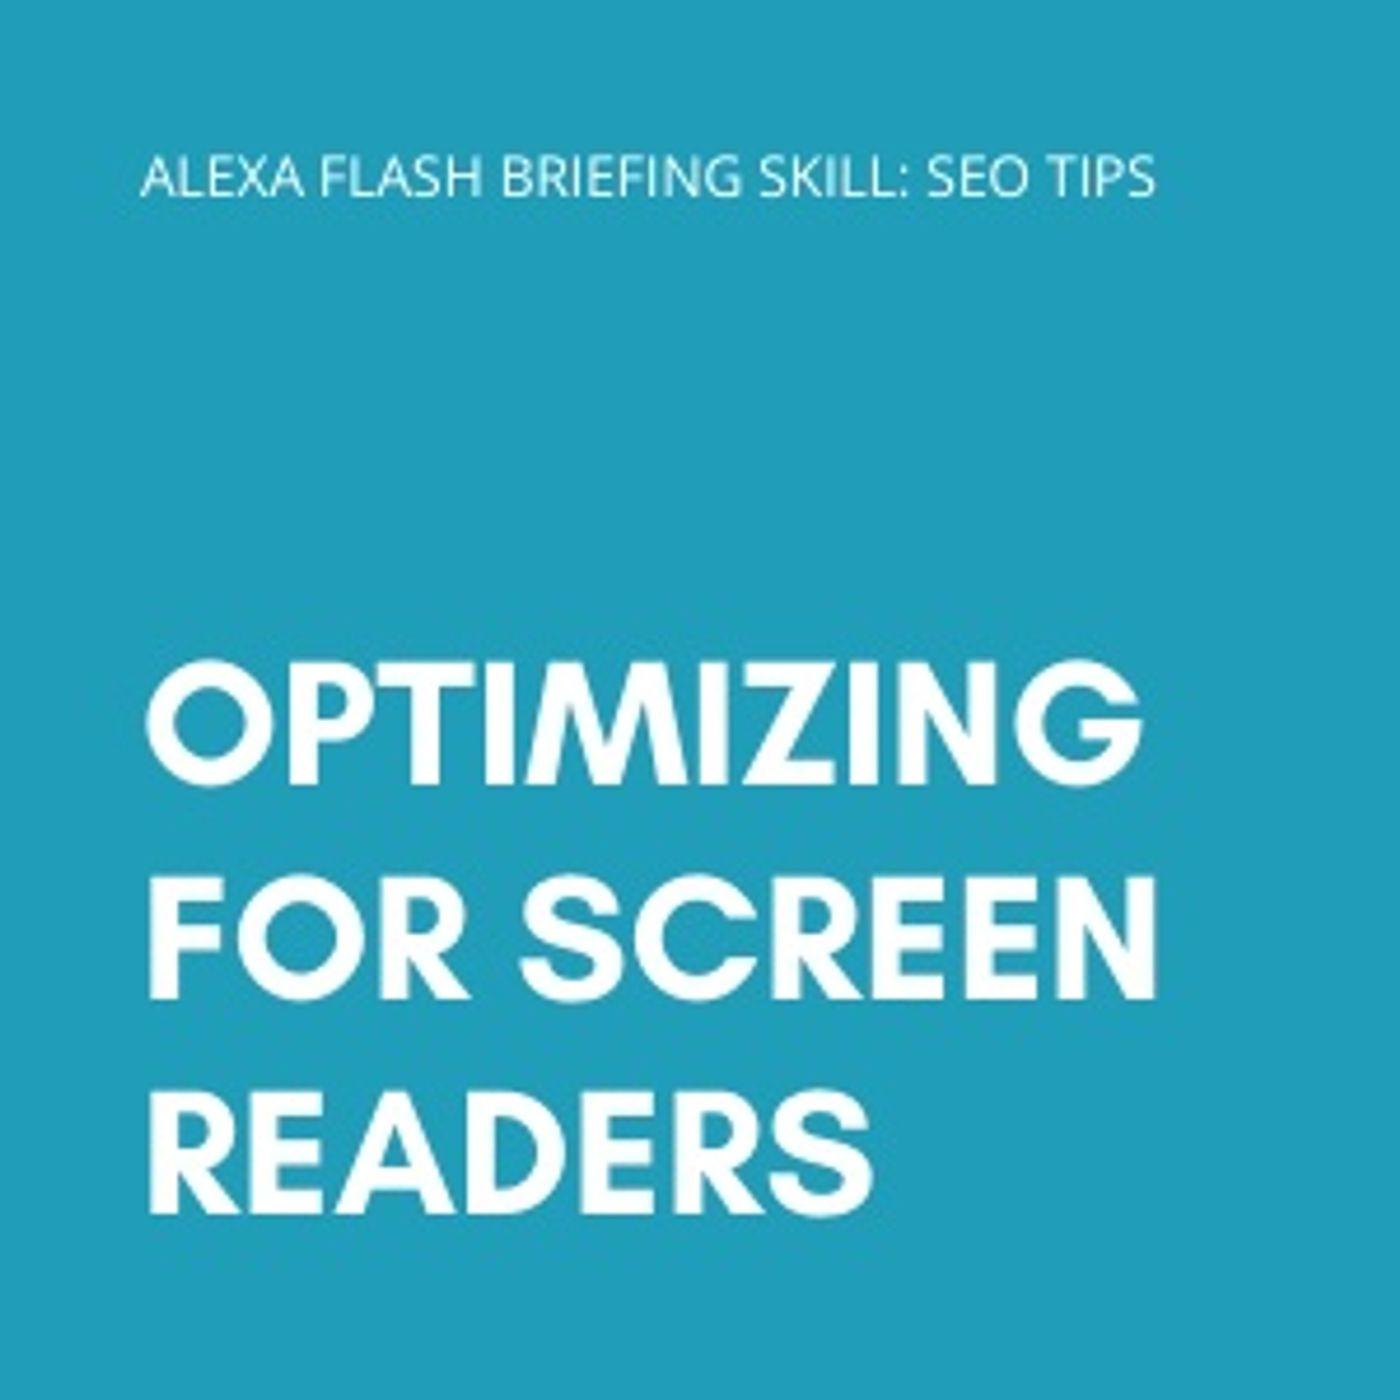 Optimizing for Screen Readers